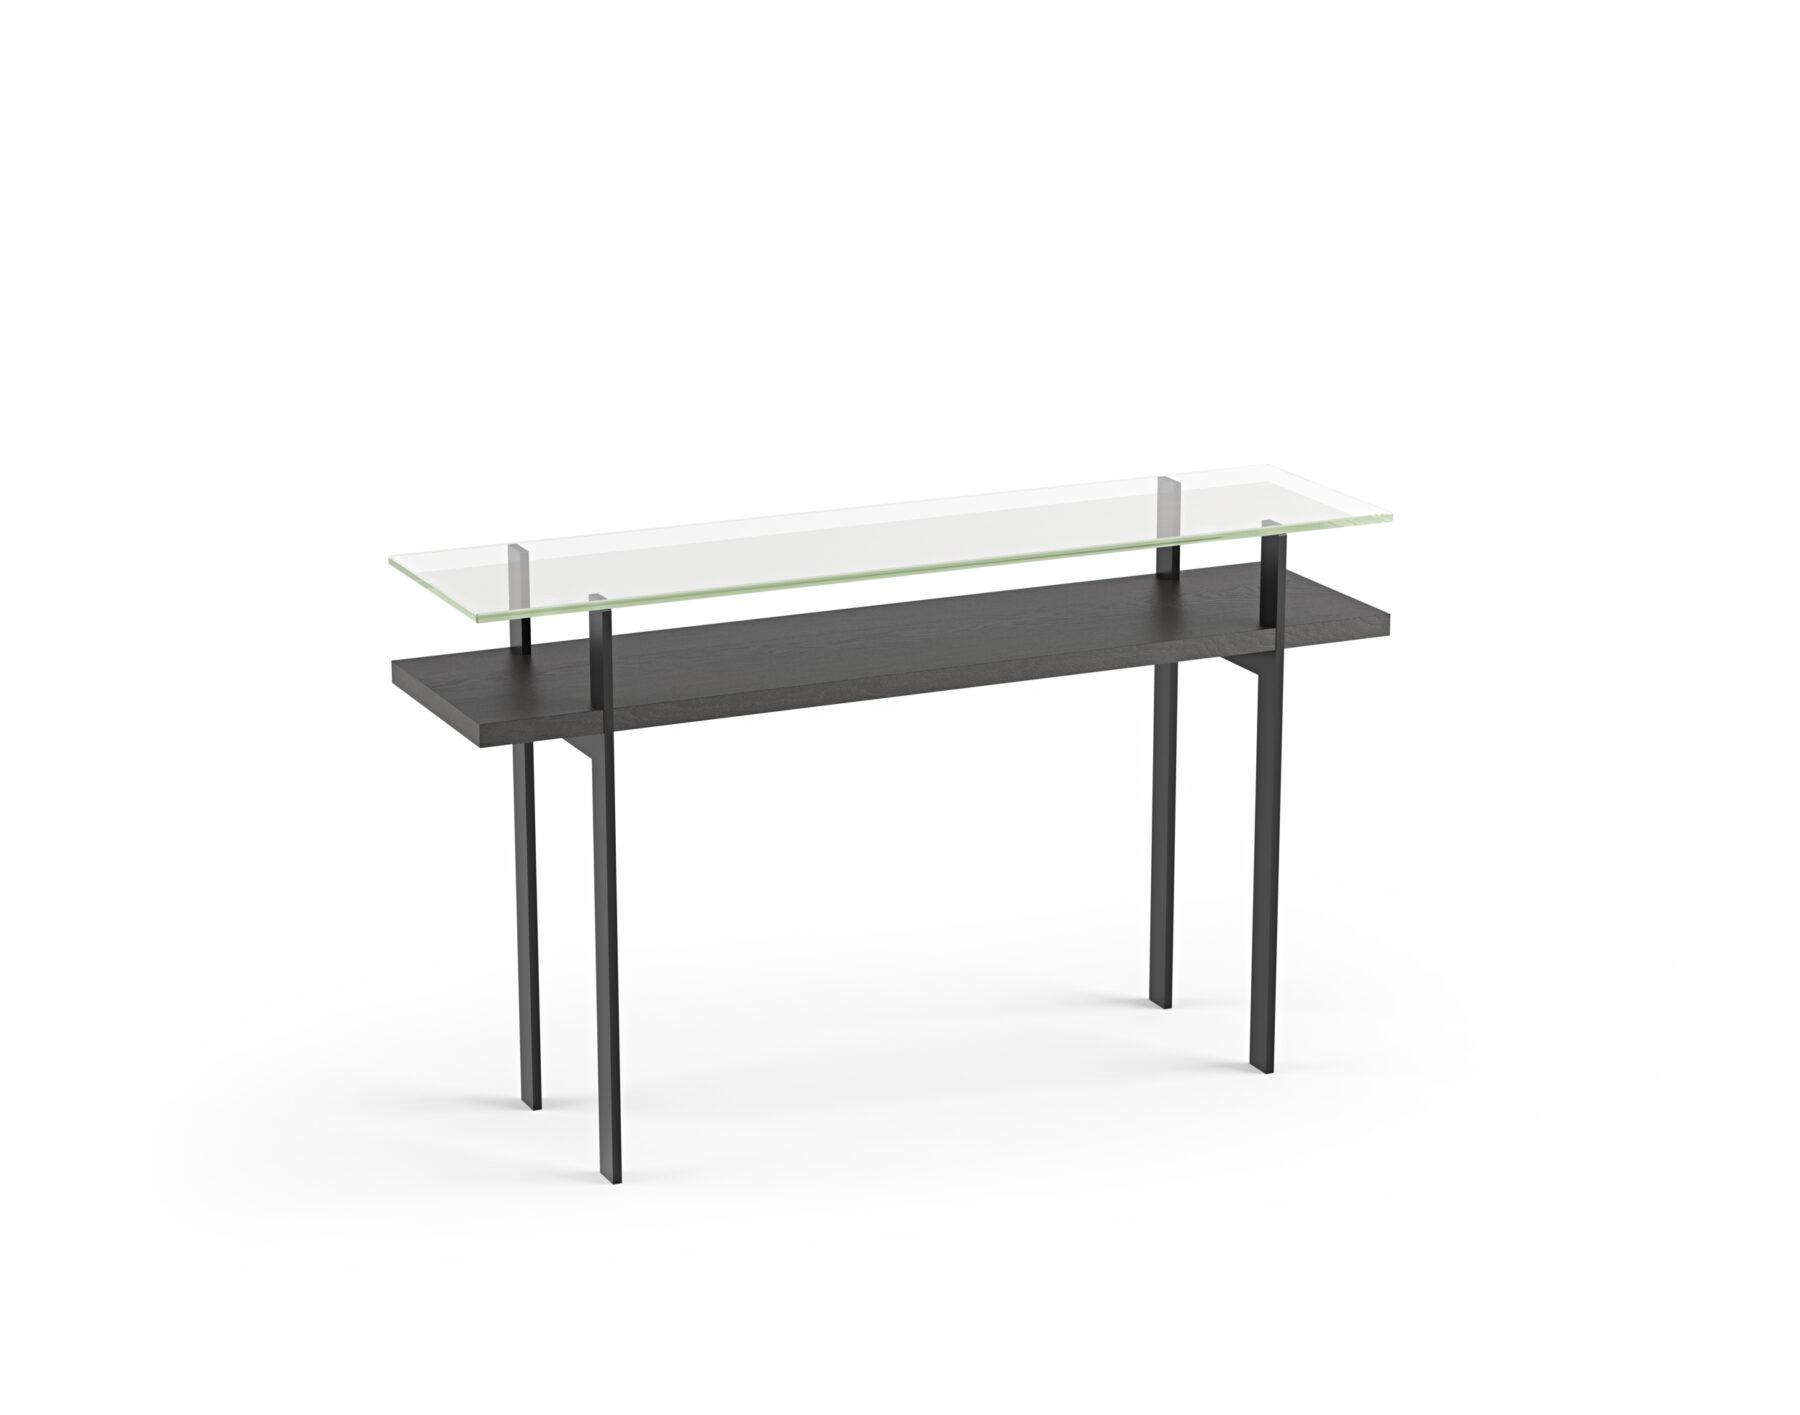 terrace-console-1153-BDI-charcoal-1